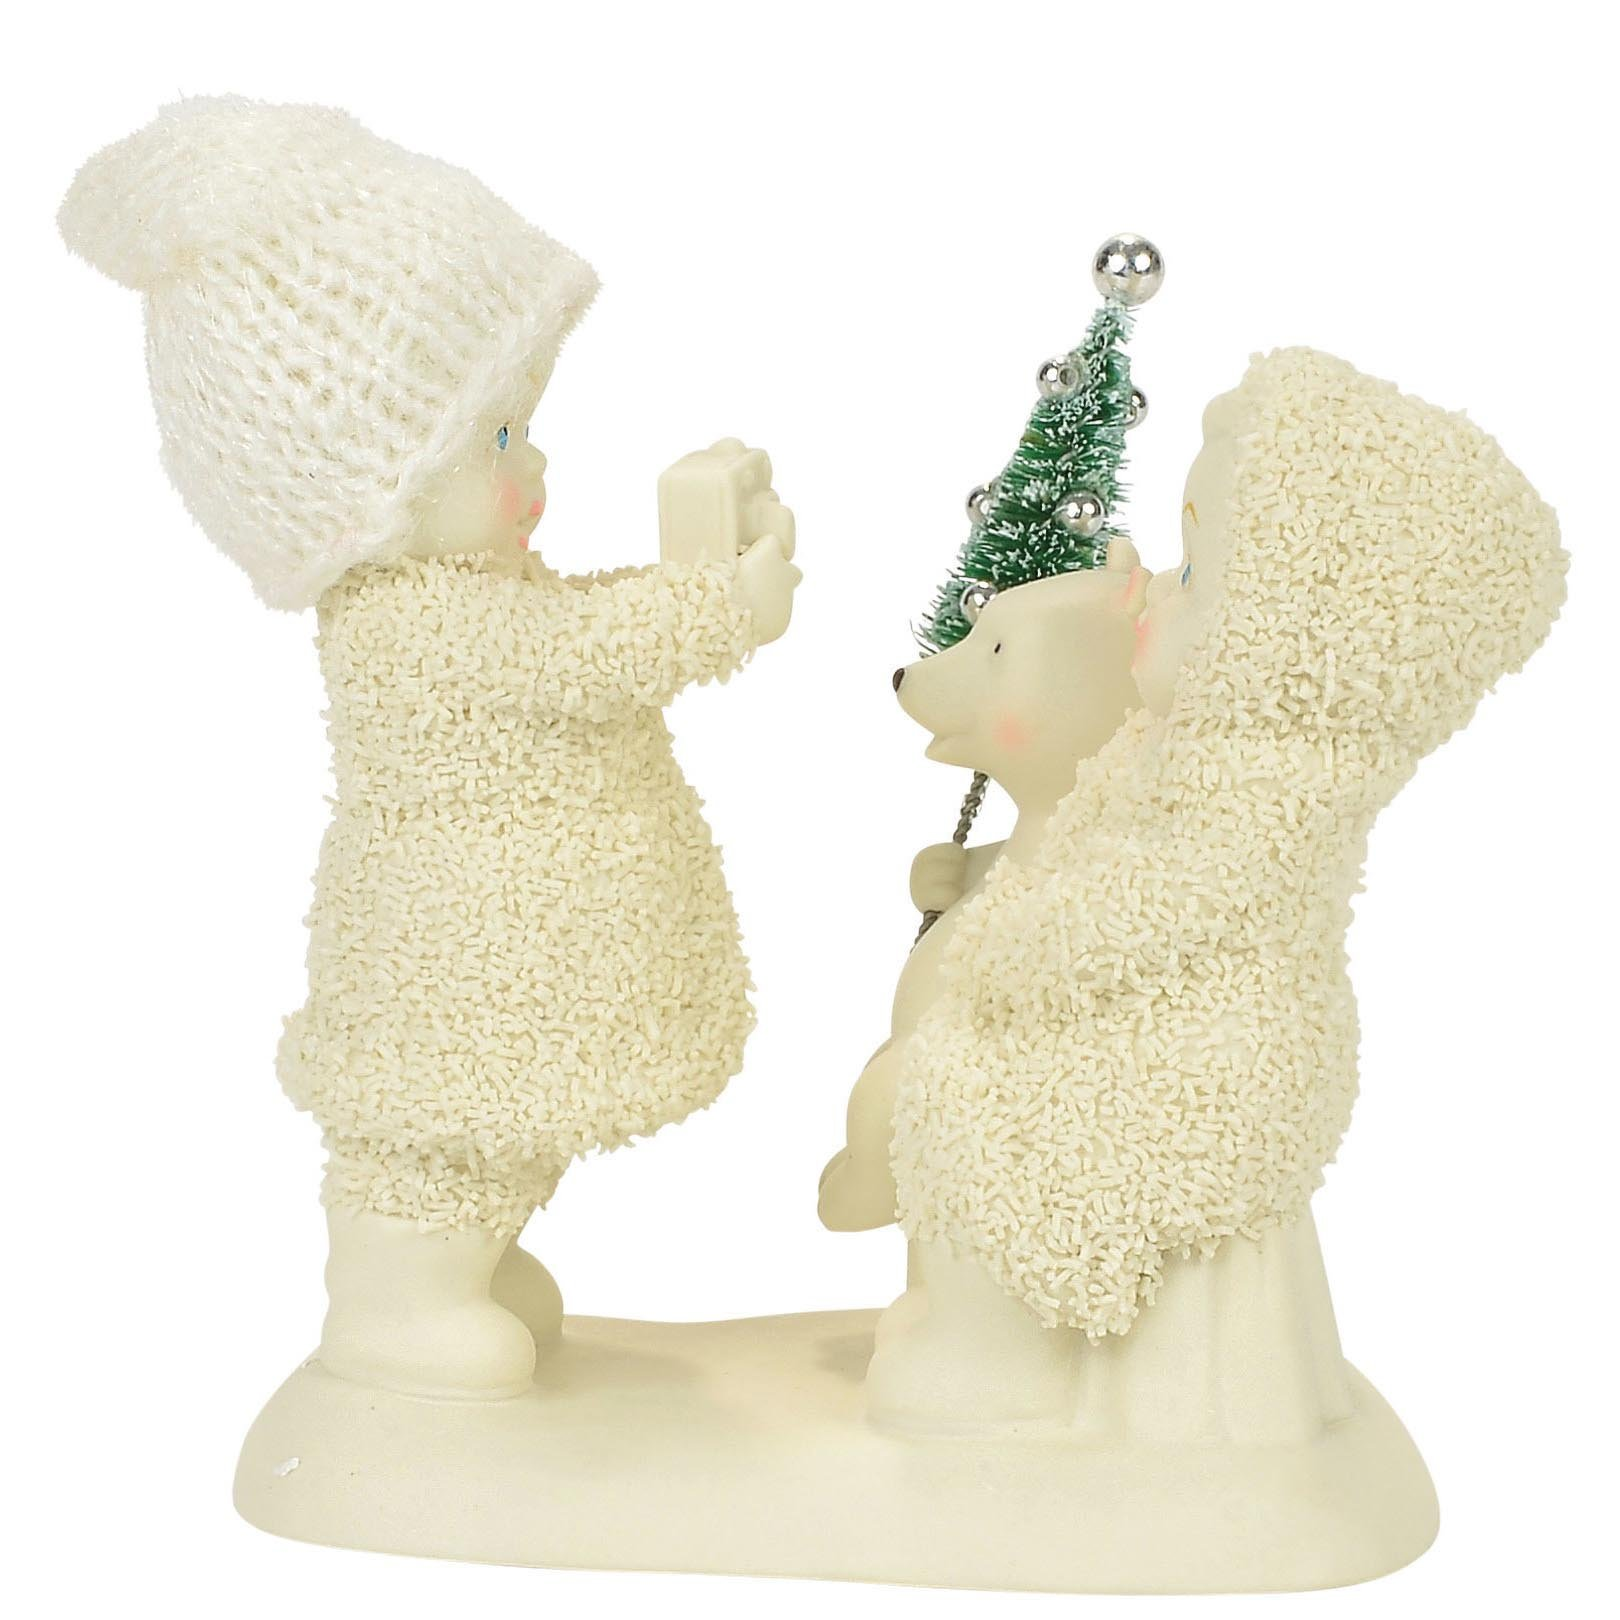 "Department 56 Snowbabies ""Say Cheese!"" Porcelain Figurine, 4"""